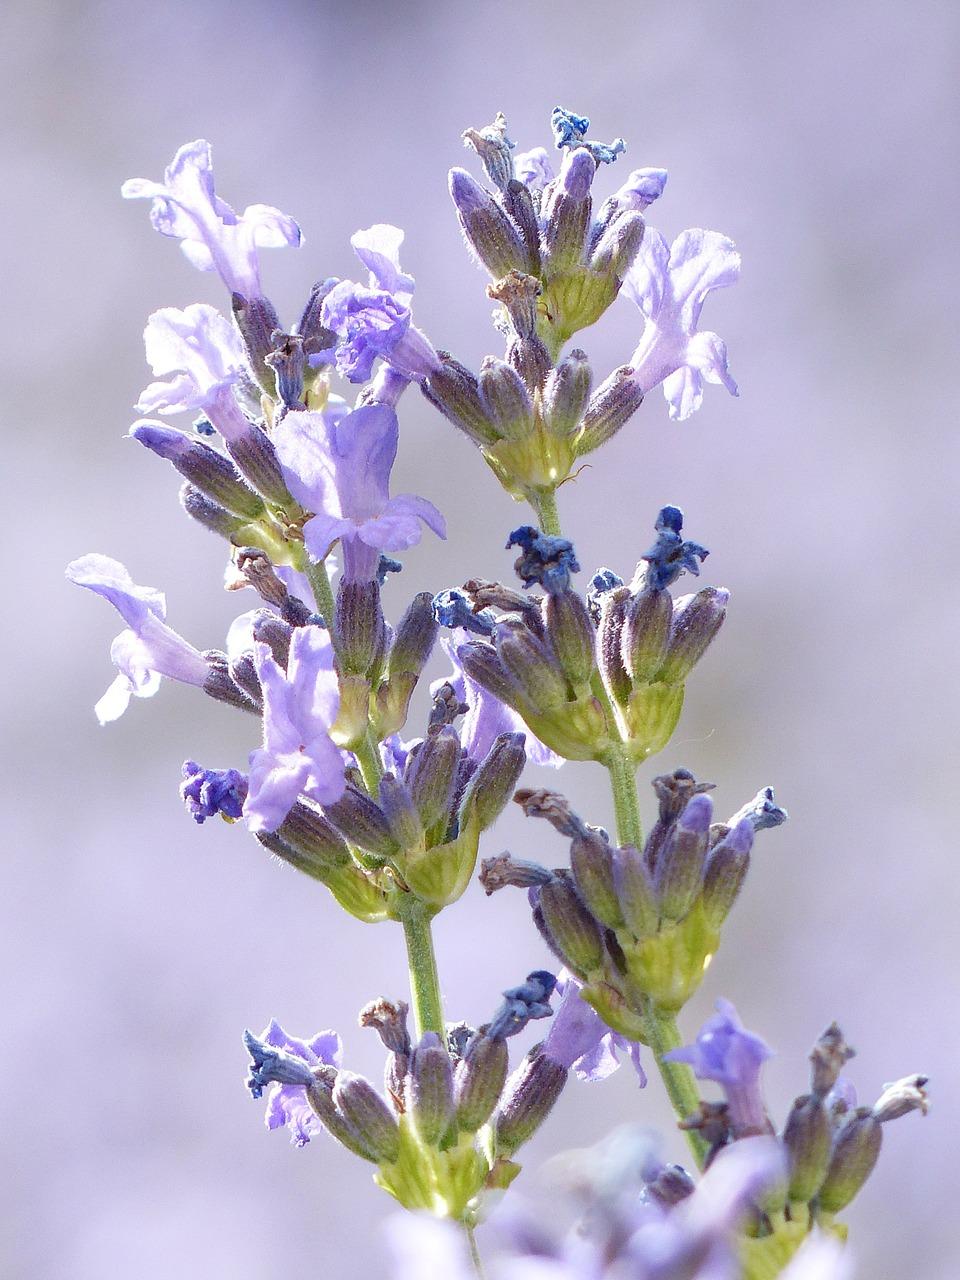 lavender-167756_1280.jpg